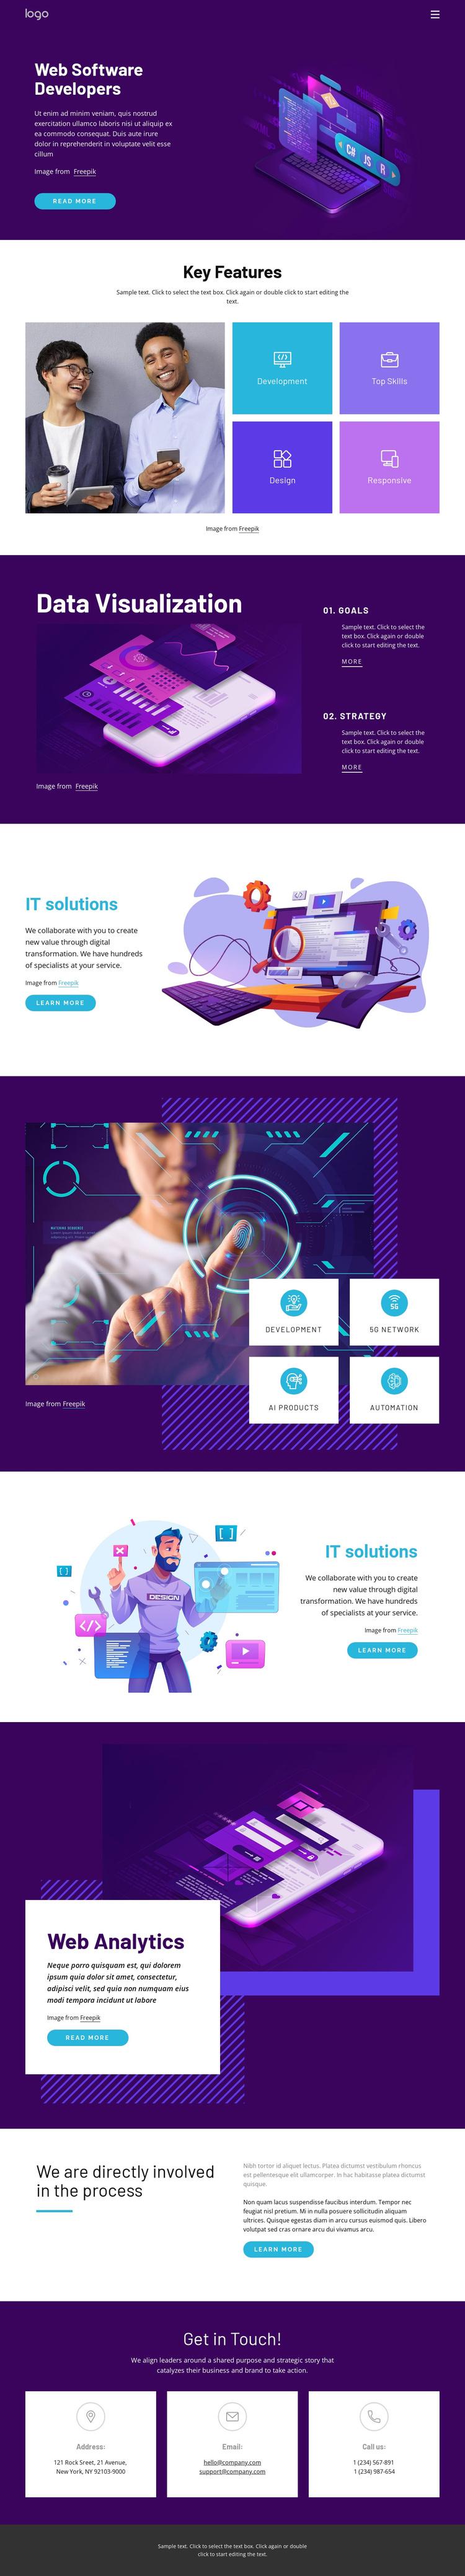 Solutions improve productivity Joomla Template